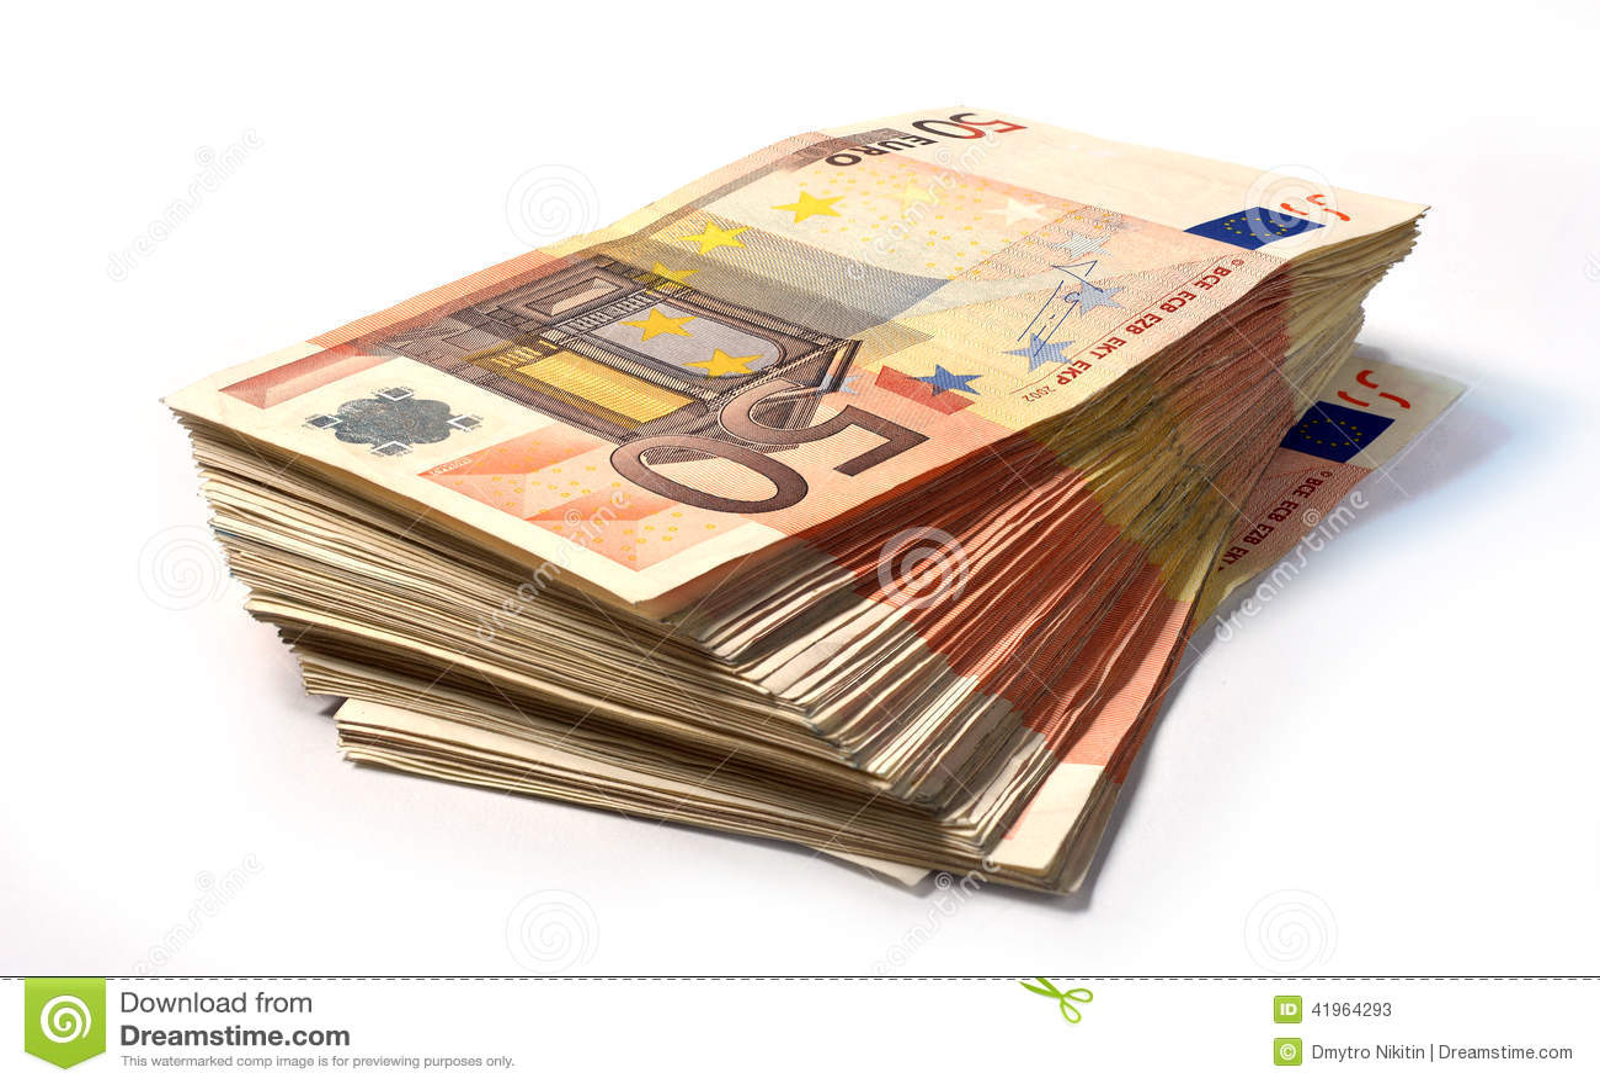 50 euro notes stock photo image 41964293. Black Bedroom Furniture Sets. Home Design Ideas